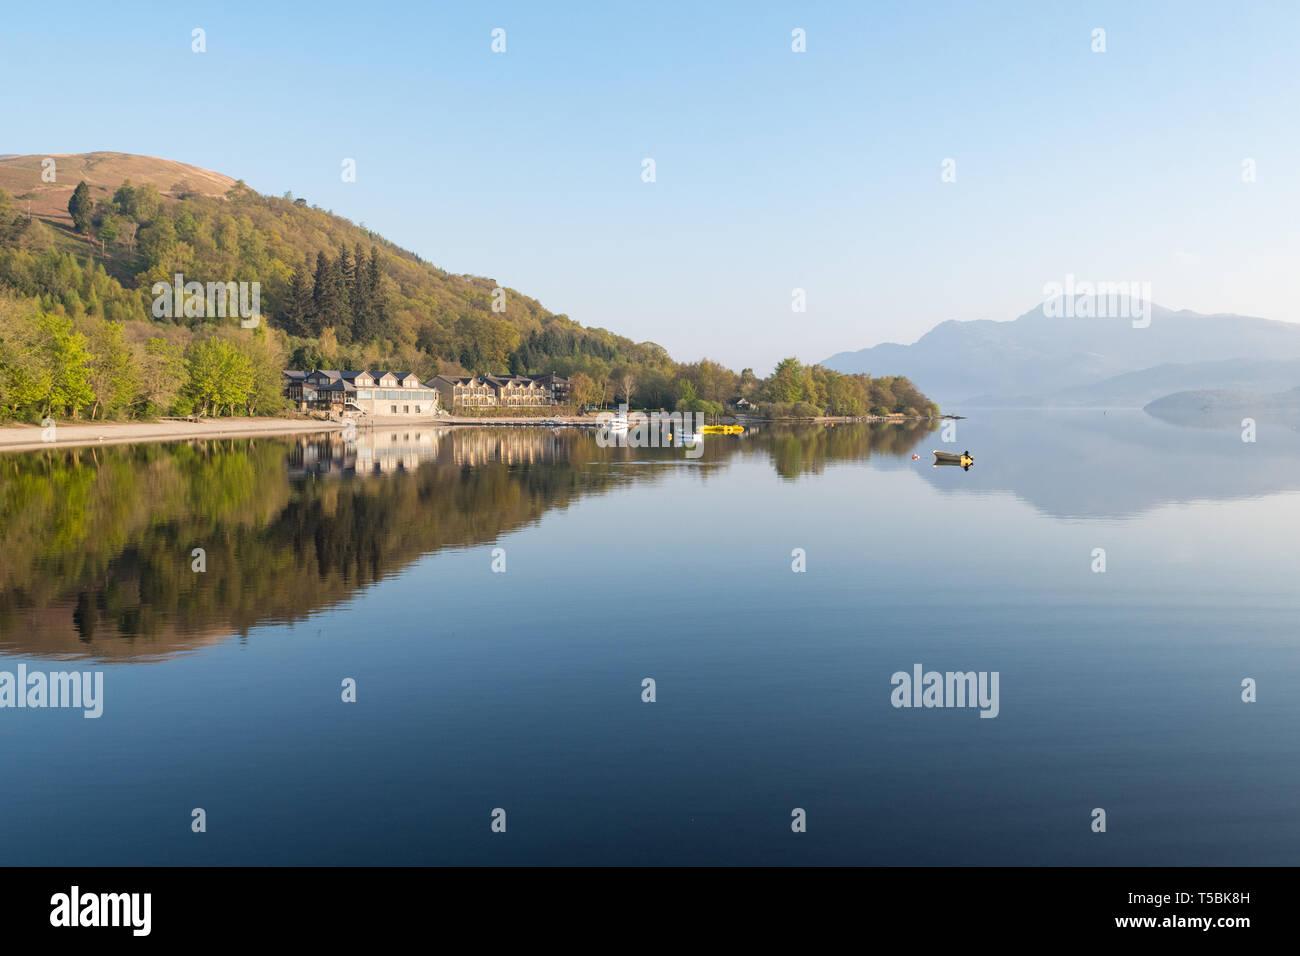 Early spring morning - Luss, Loch Lomond, Scotland, UK - Stock Image